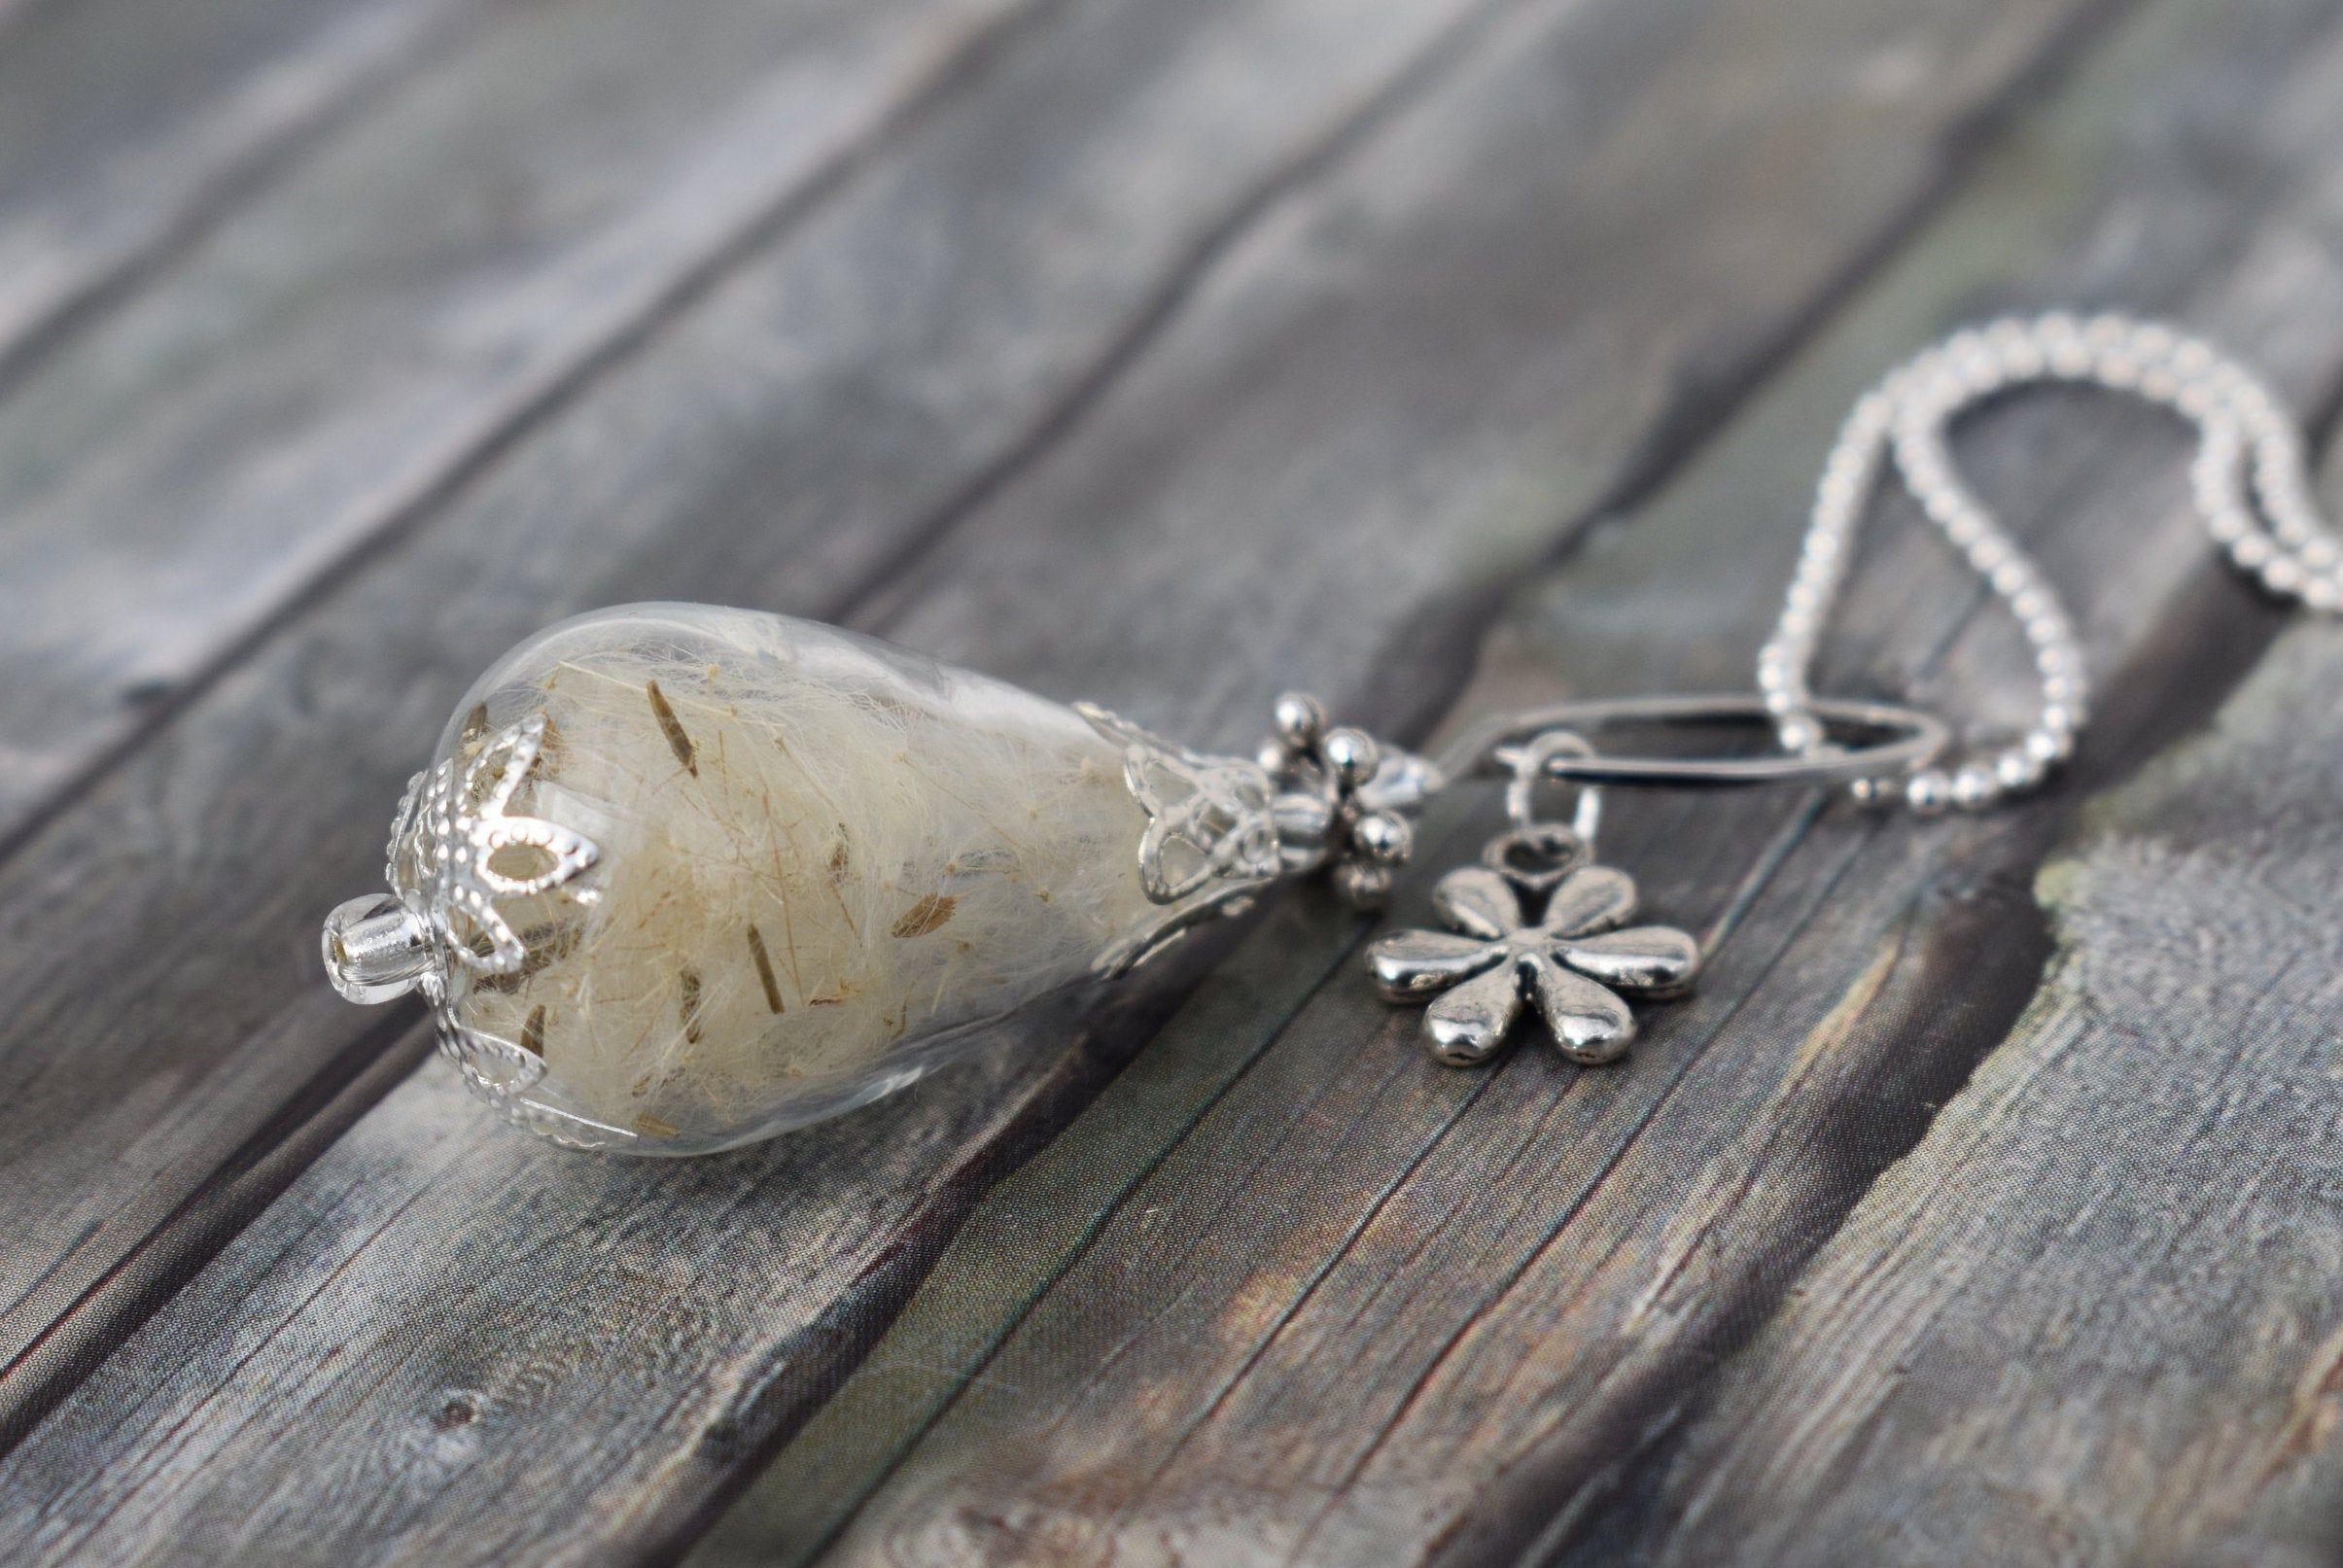 Chain/necklace/glass beaded necklace/pendant necklace/long necklace/chain woman/unique/unique jewellery ' pusteblume/dandelion '